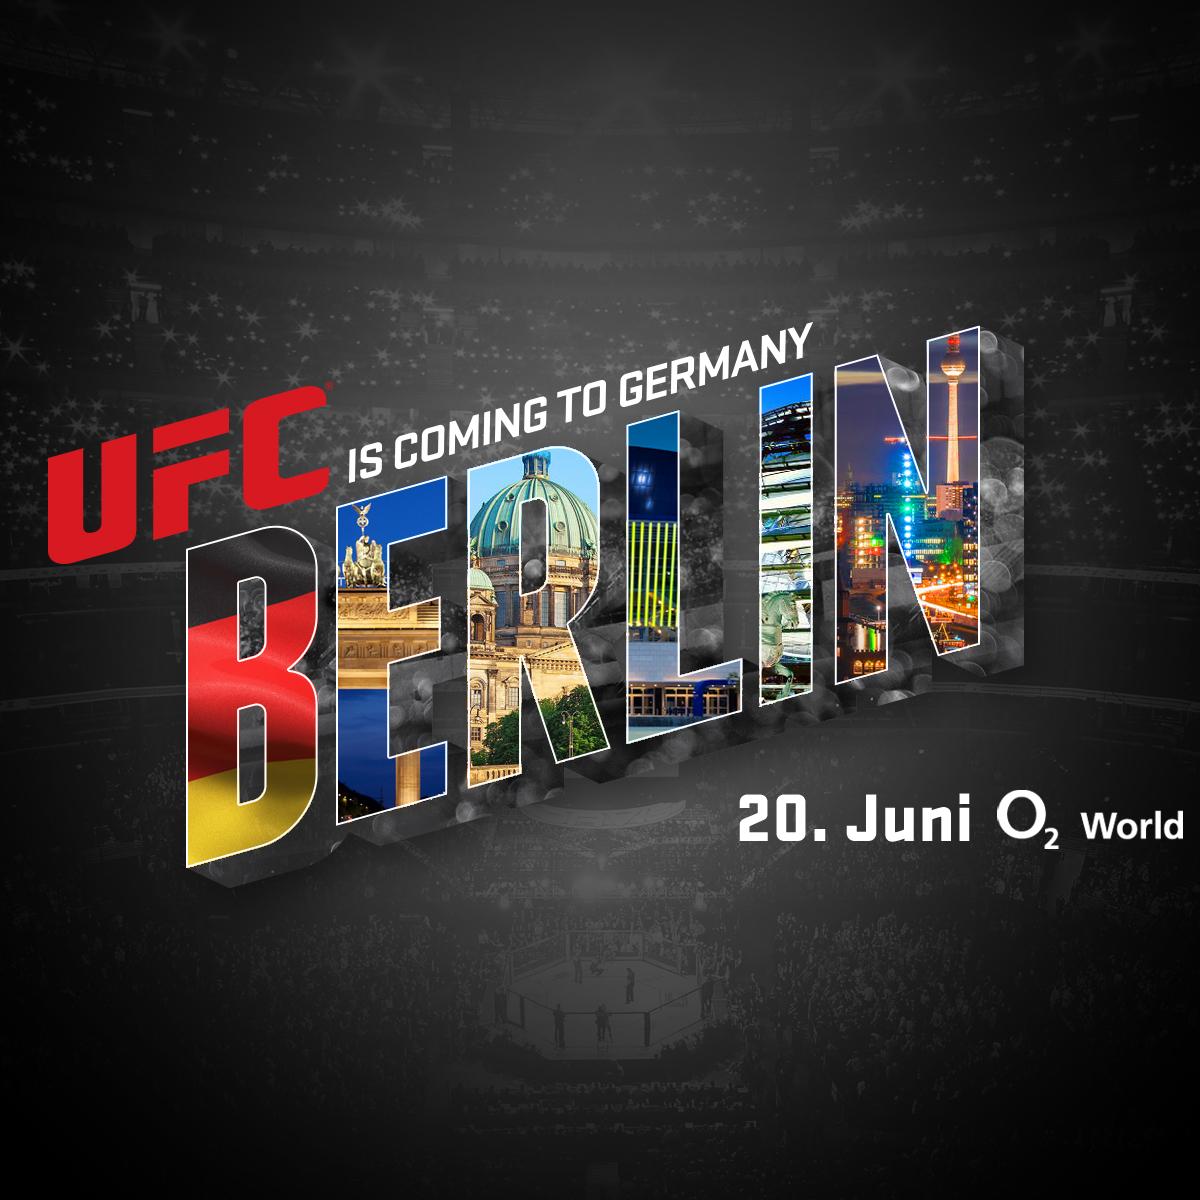 UFCisCOMING_1200x1200_Berlin_o2WLogo-1.jpg